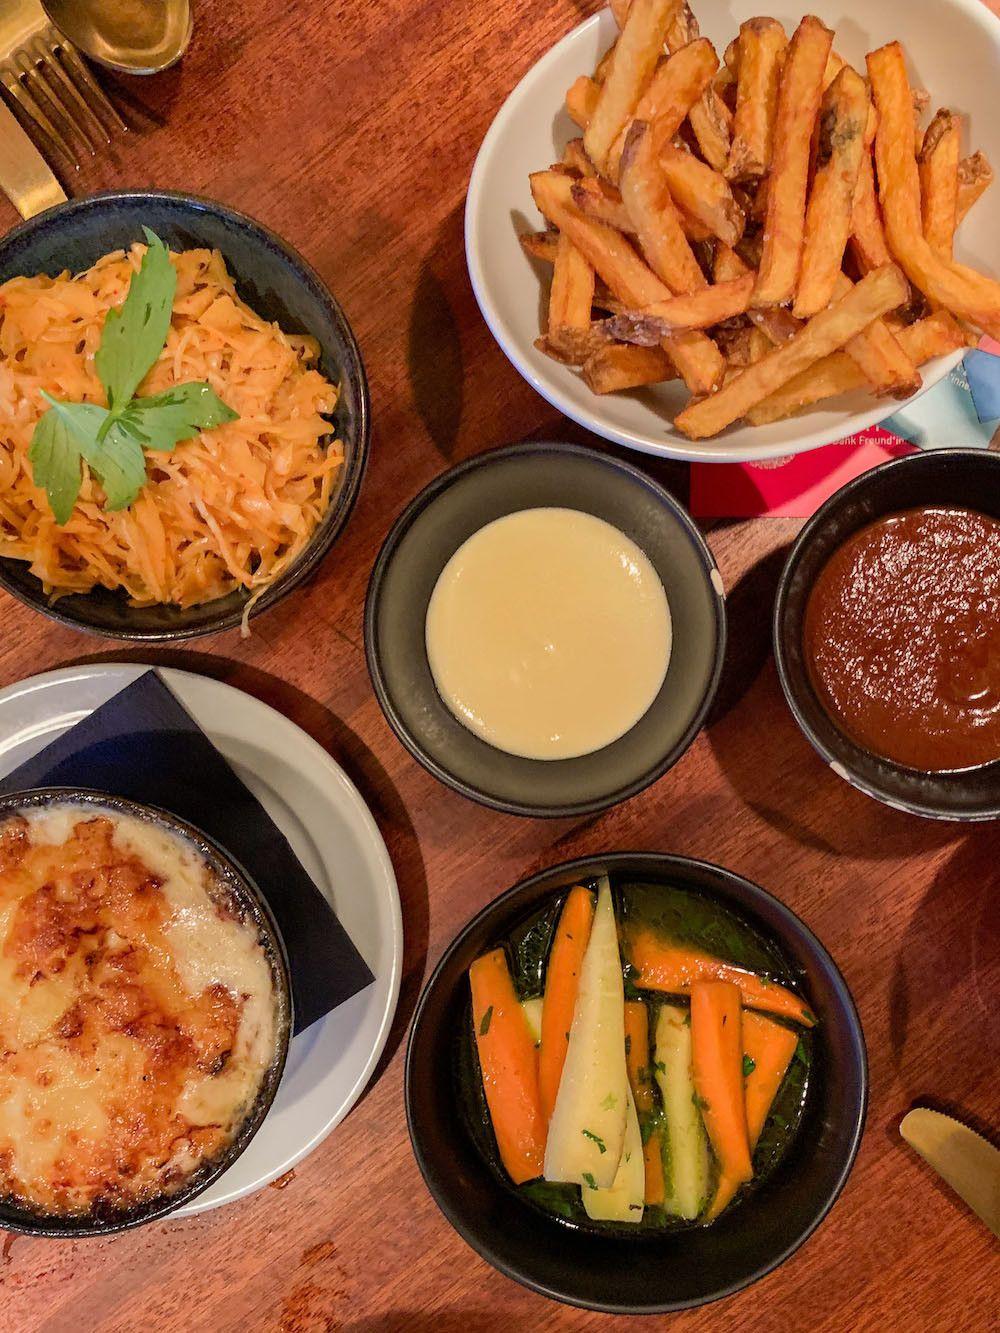 Foodblogog, Leckerbissen, Crackers, Beilagen, Fries, Gratin